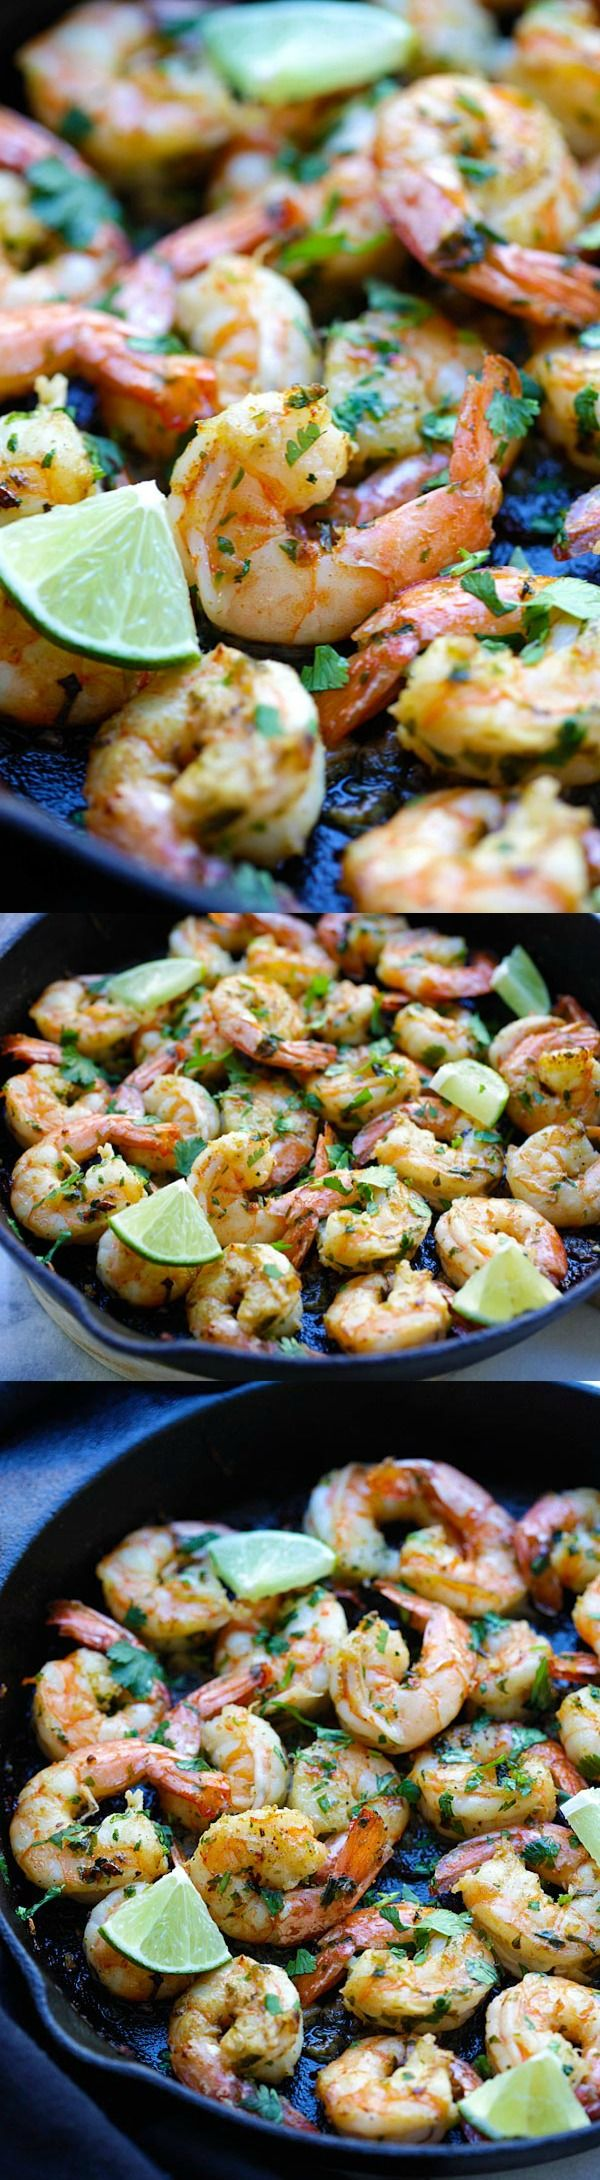 Cilantro Lime Shrimp - best shrimp ever with cilantro, lime & garlic on sizzling skillet. Crazy delicious recipe, takes 15 mins | rasamalaysia.com